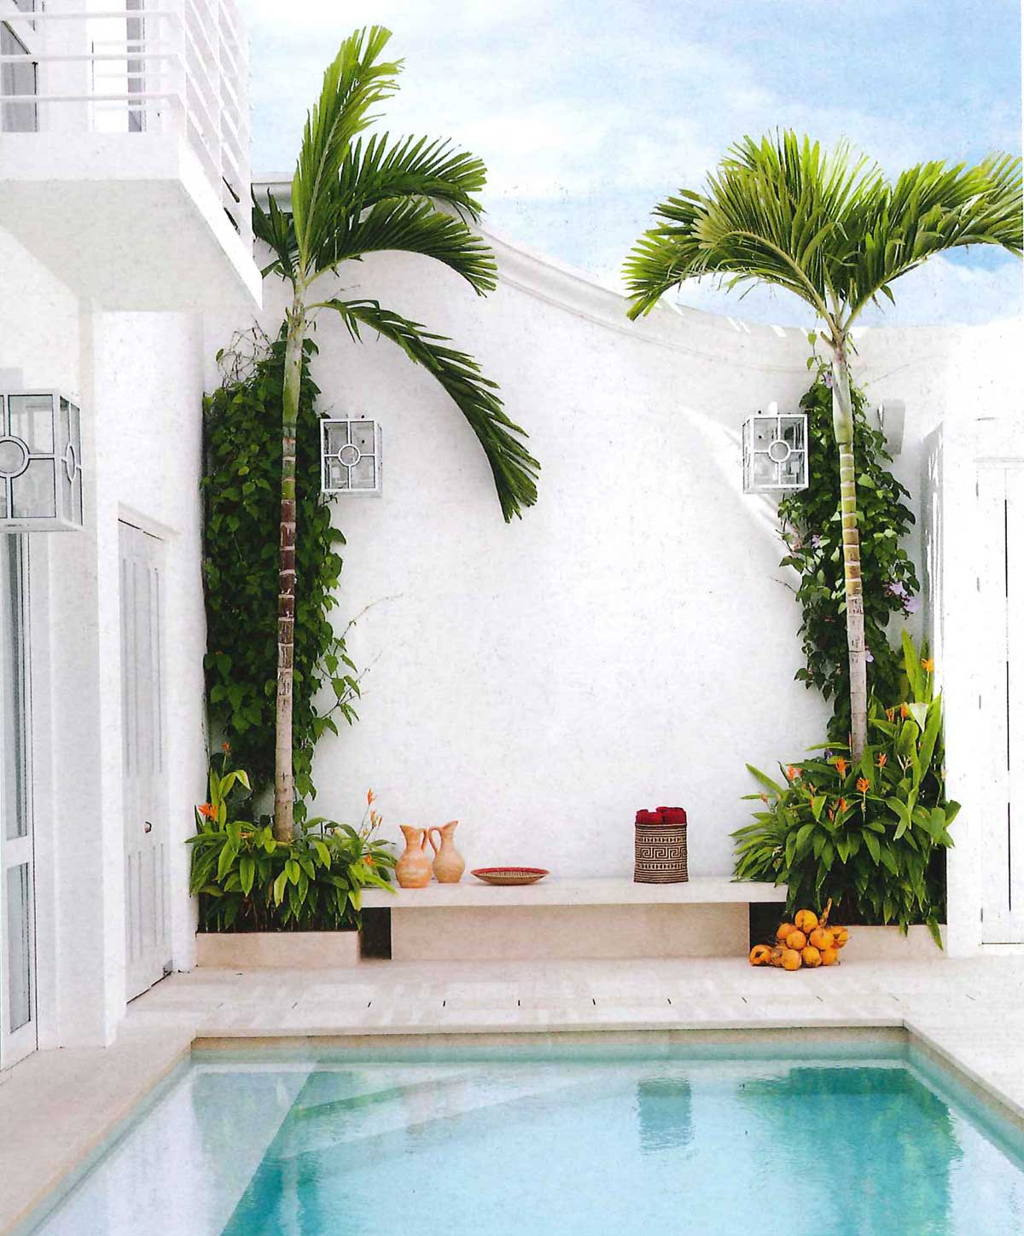 Modern swimming pool design inspiration and garden via Thou Swell #swimmingpool #poolinspiration #outdoorpool #pooldesign #pool